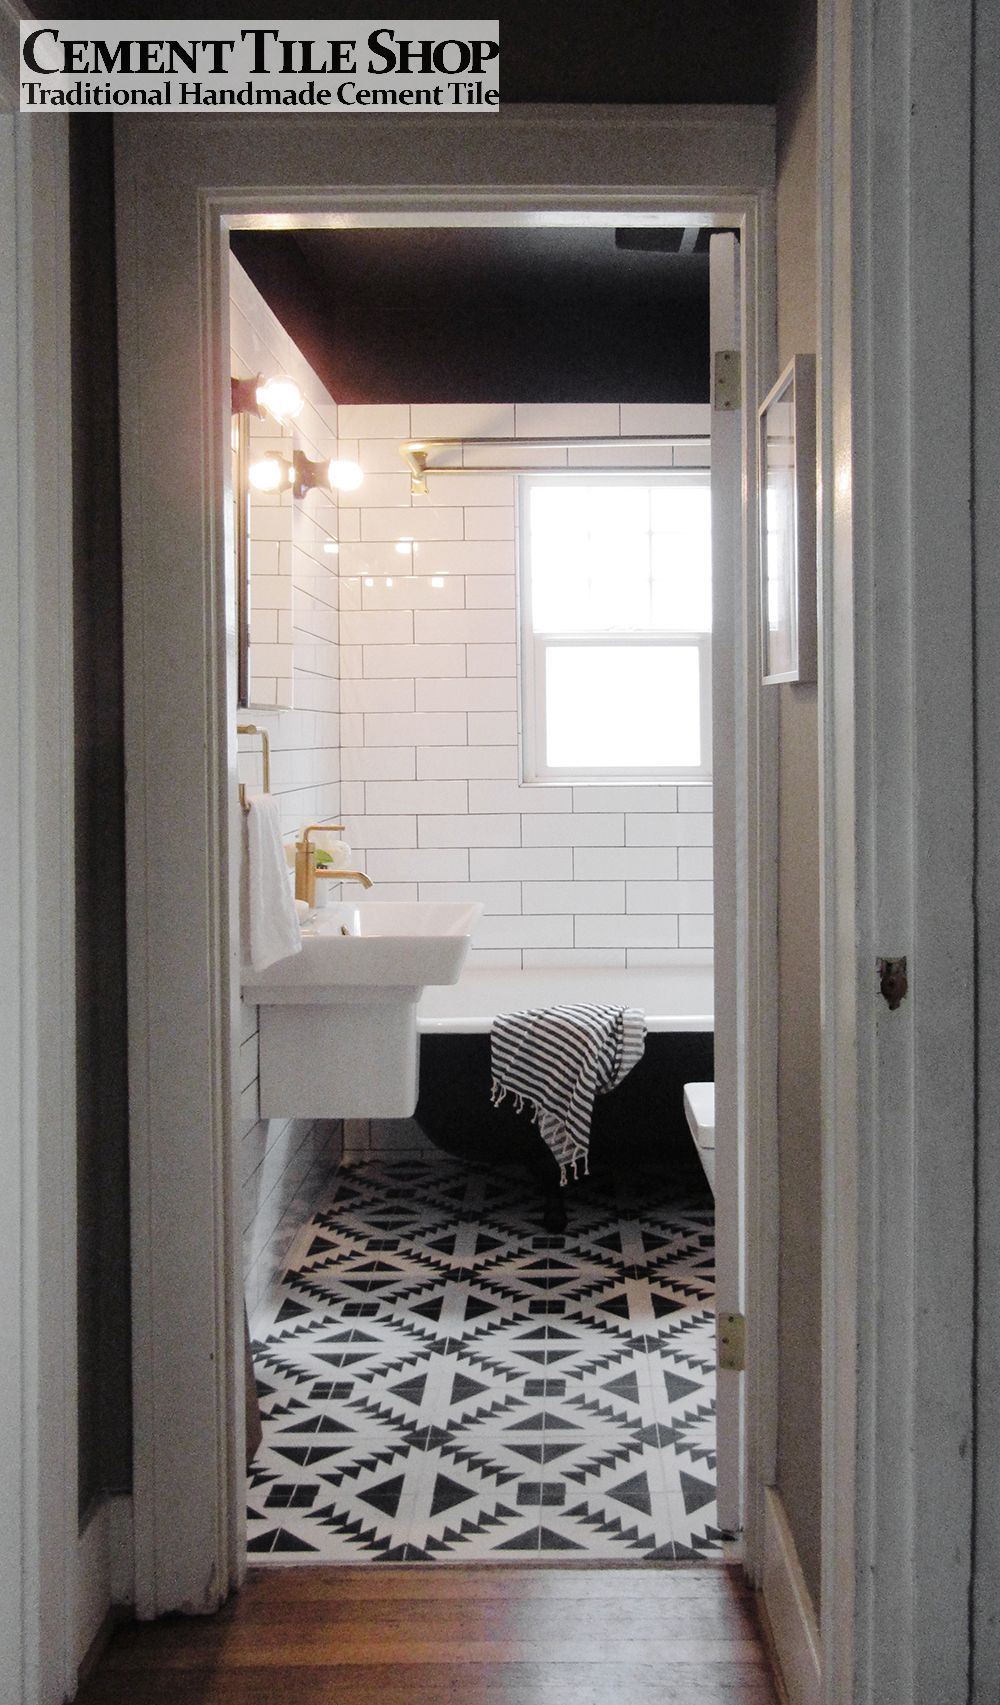 Black grouting bathroom - Cement Tile Shop Handmade Cement Tile Tulum Pattern Photo Credit Capree Kimball